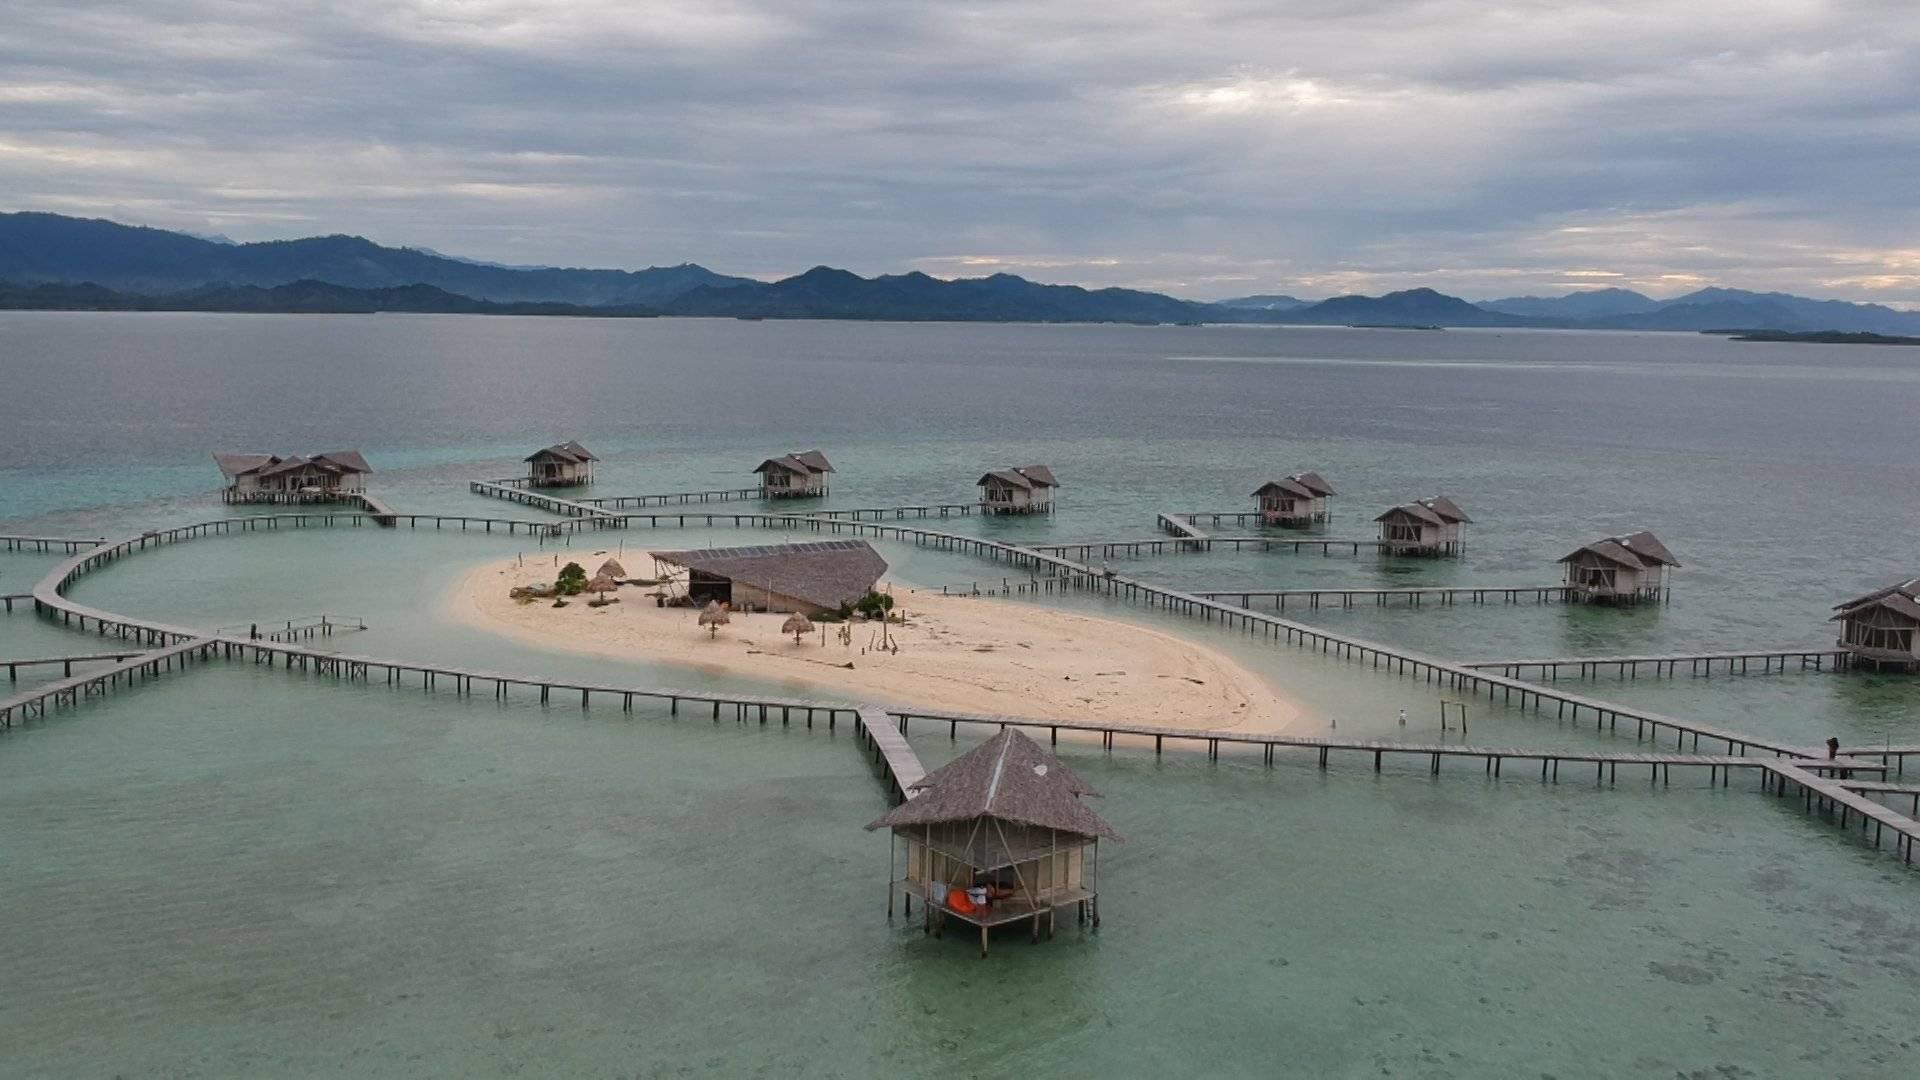 Photo 3: Pulo Cinta, un endroit merveilleusement romantique